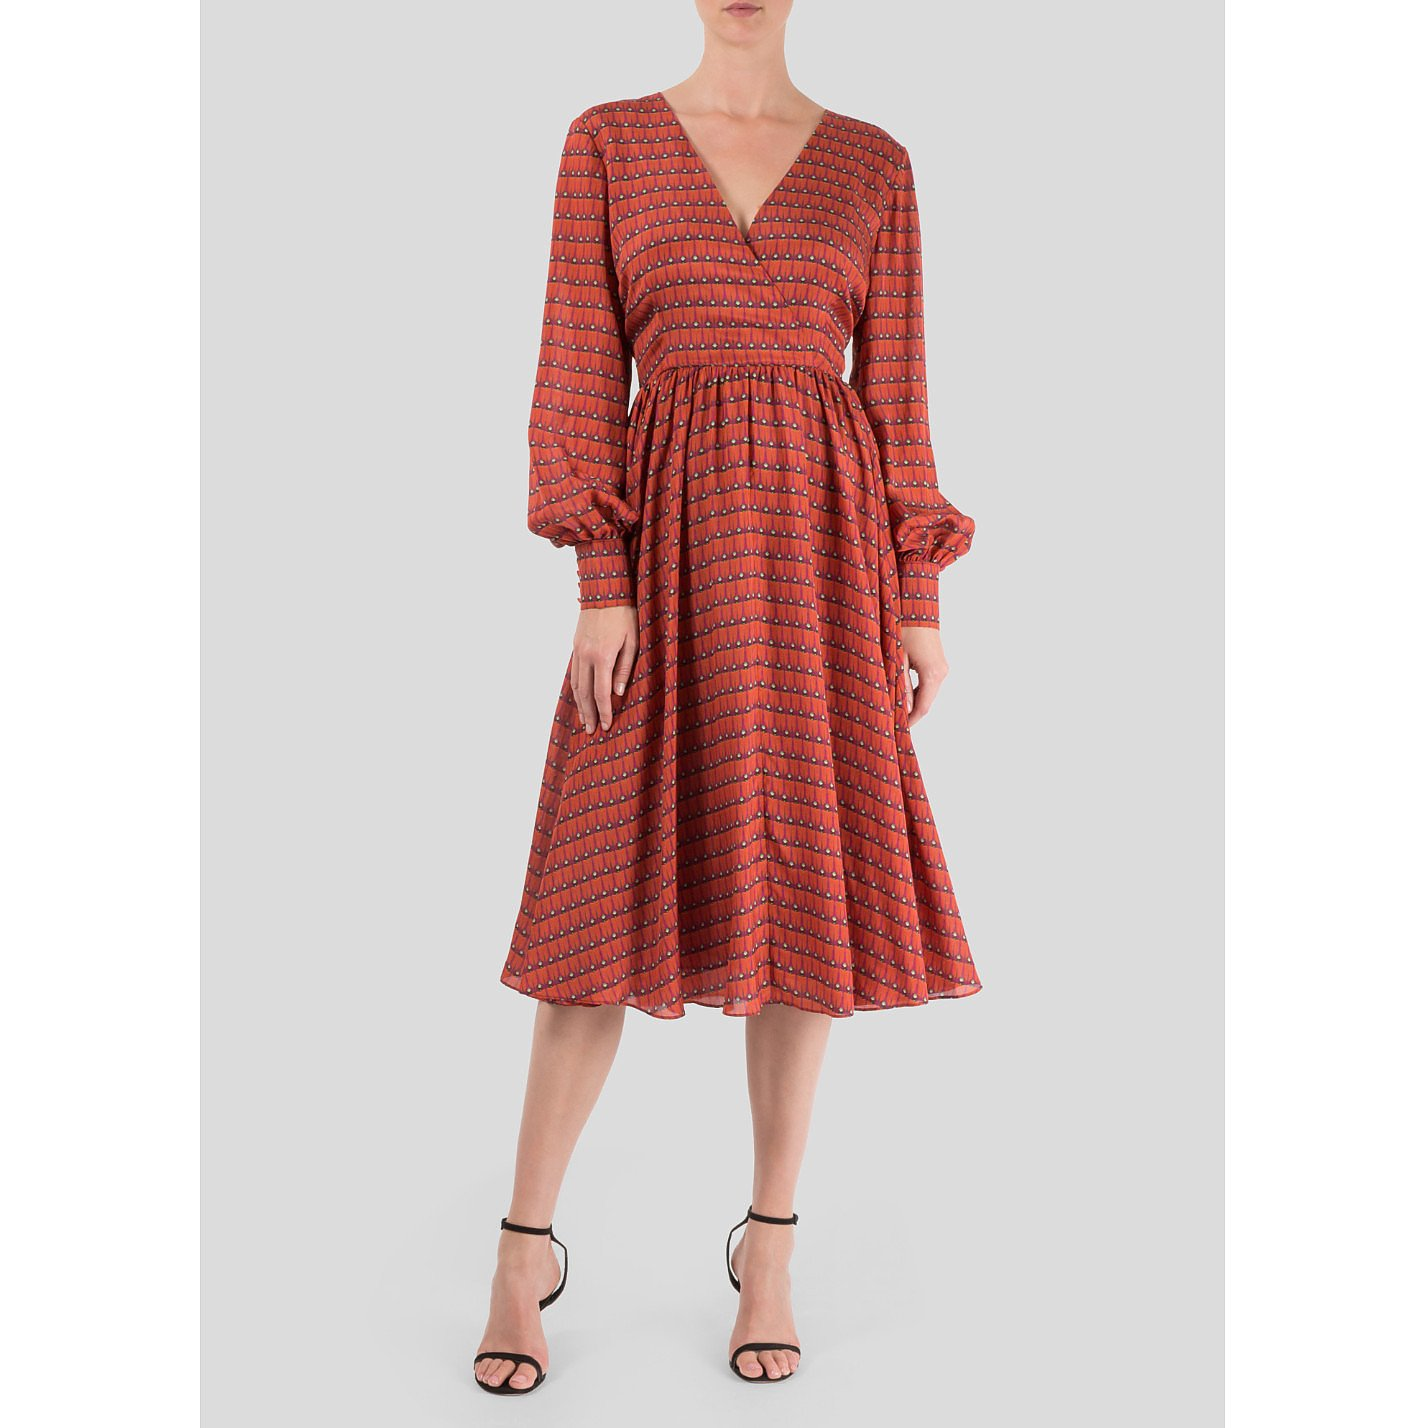 Dhela Firebug Silk Dress